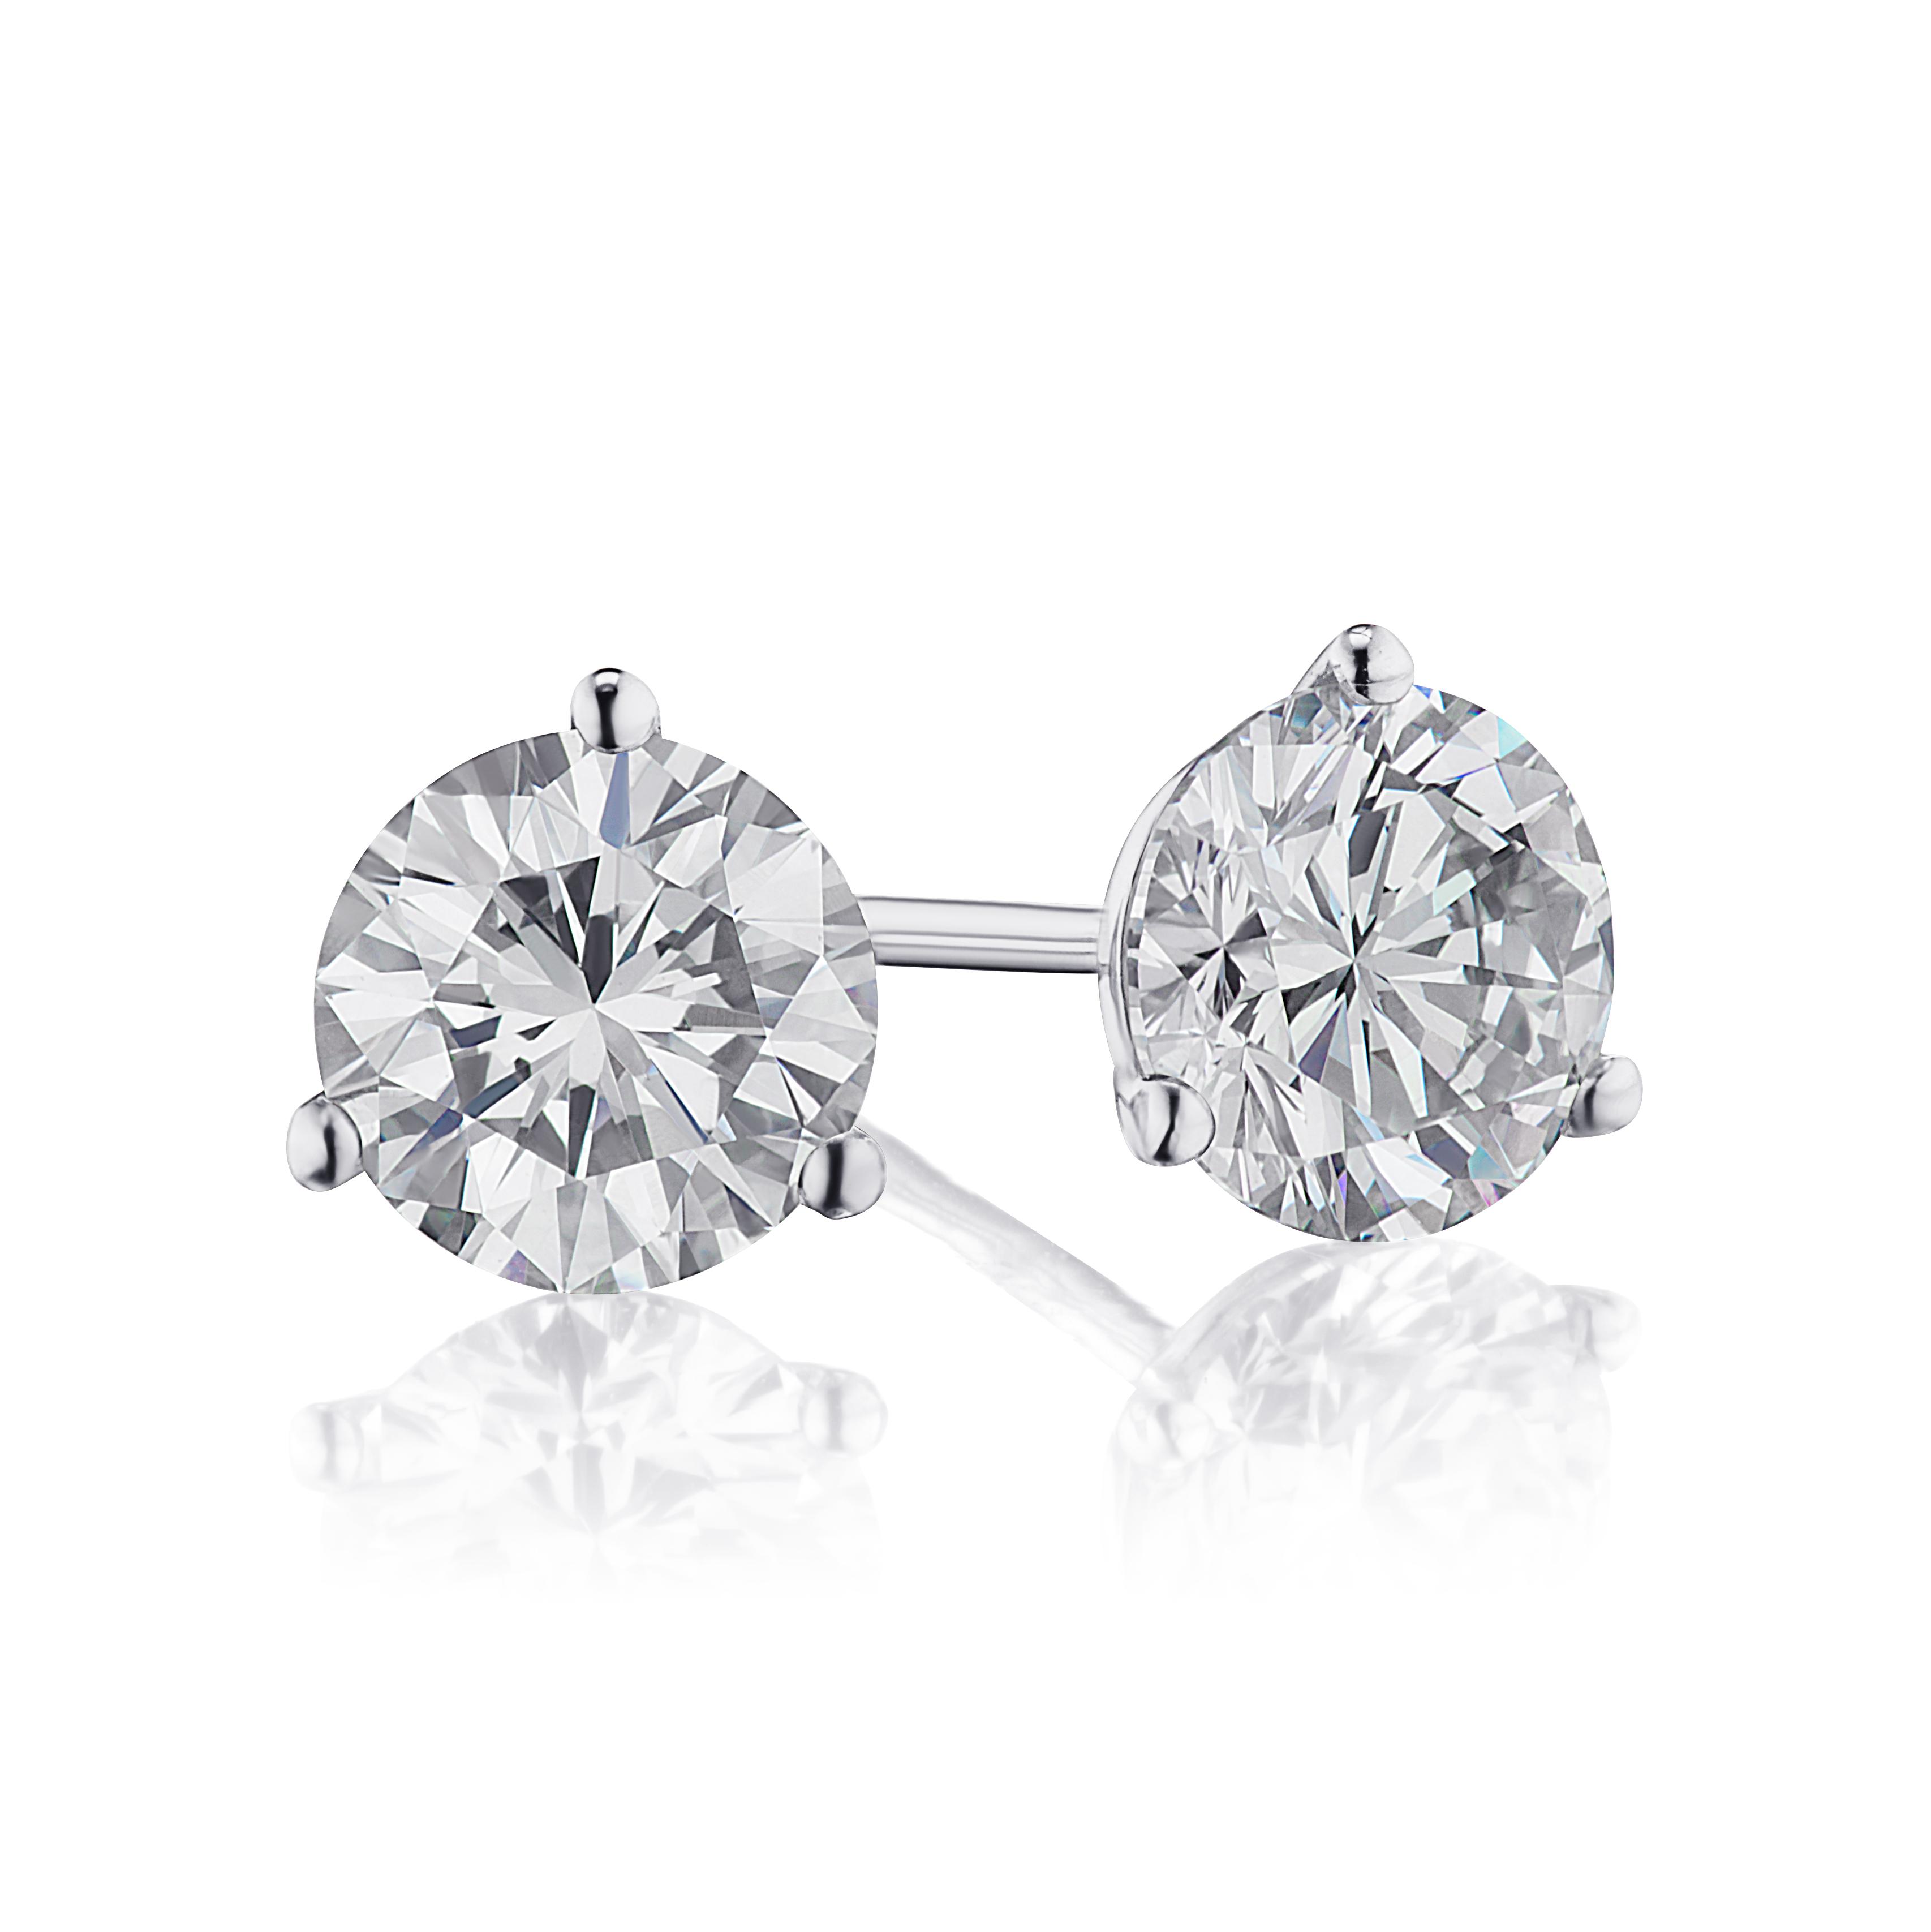 1.53ctw. Diamond Studs